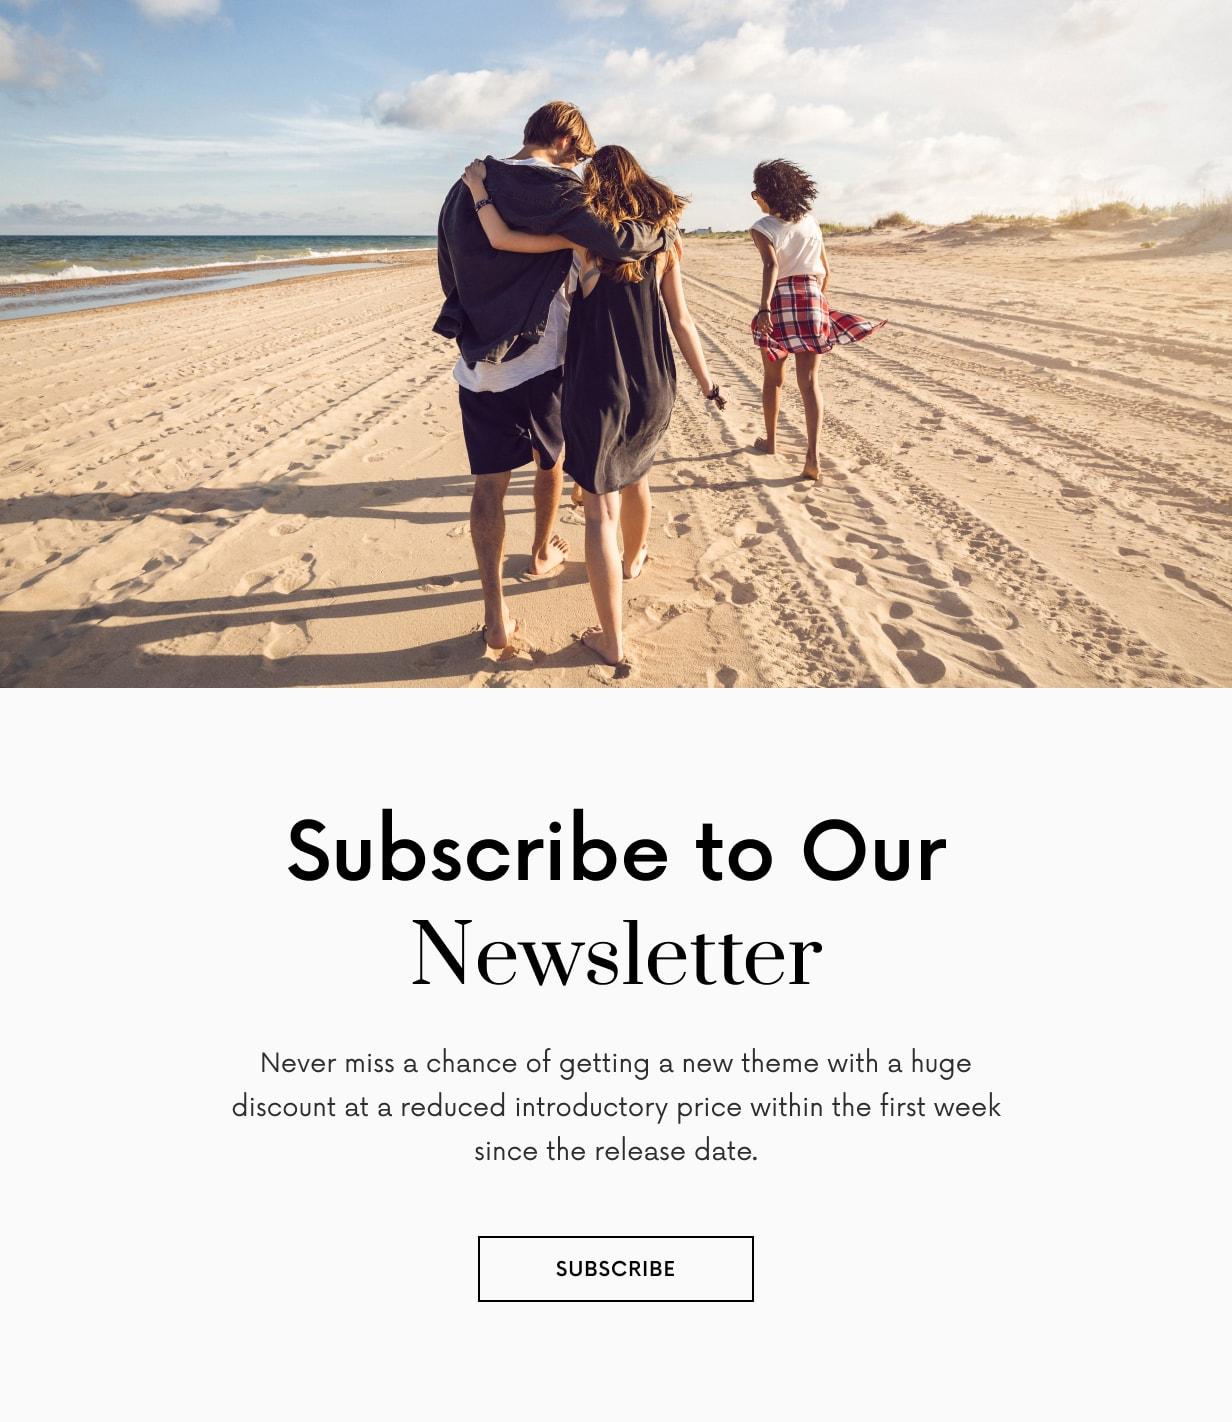 Einmal - Sauberes und elegantes WordPress-Blog-Thema - 69